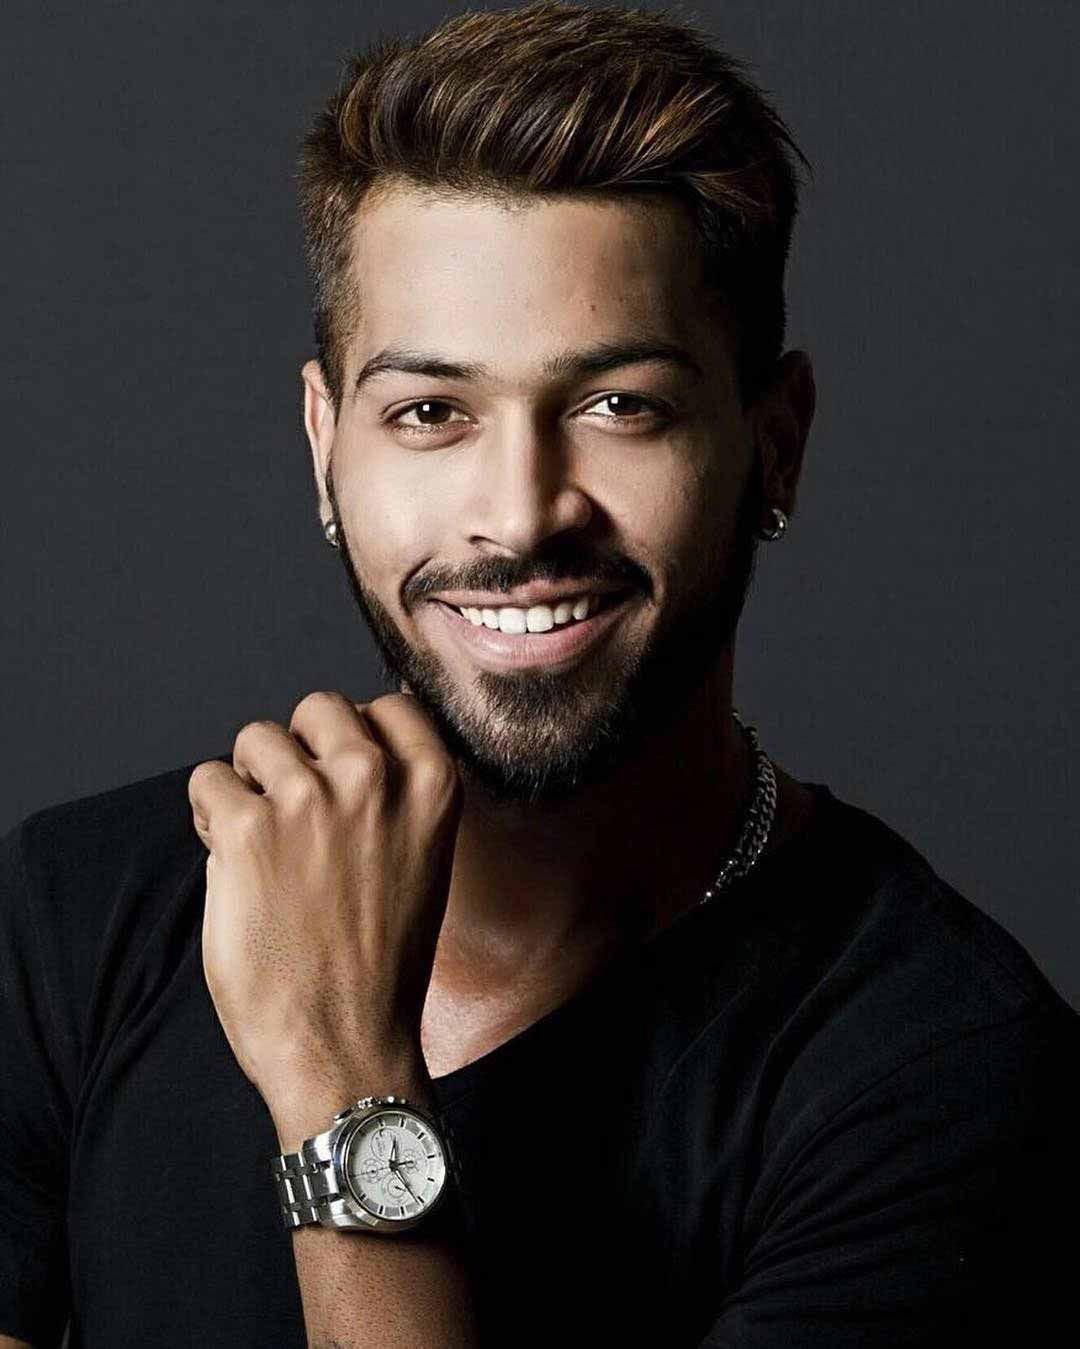 Sin Denim Launches Its First Tvc Featuring Hardik Pandya Gamechange 9xm Brandfactory Central Hardikpandya I Cricket Wallpapers Cricket Mumbai Indians Ipl